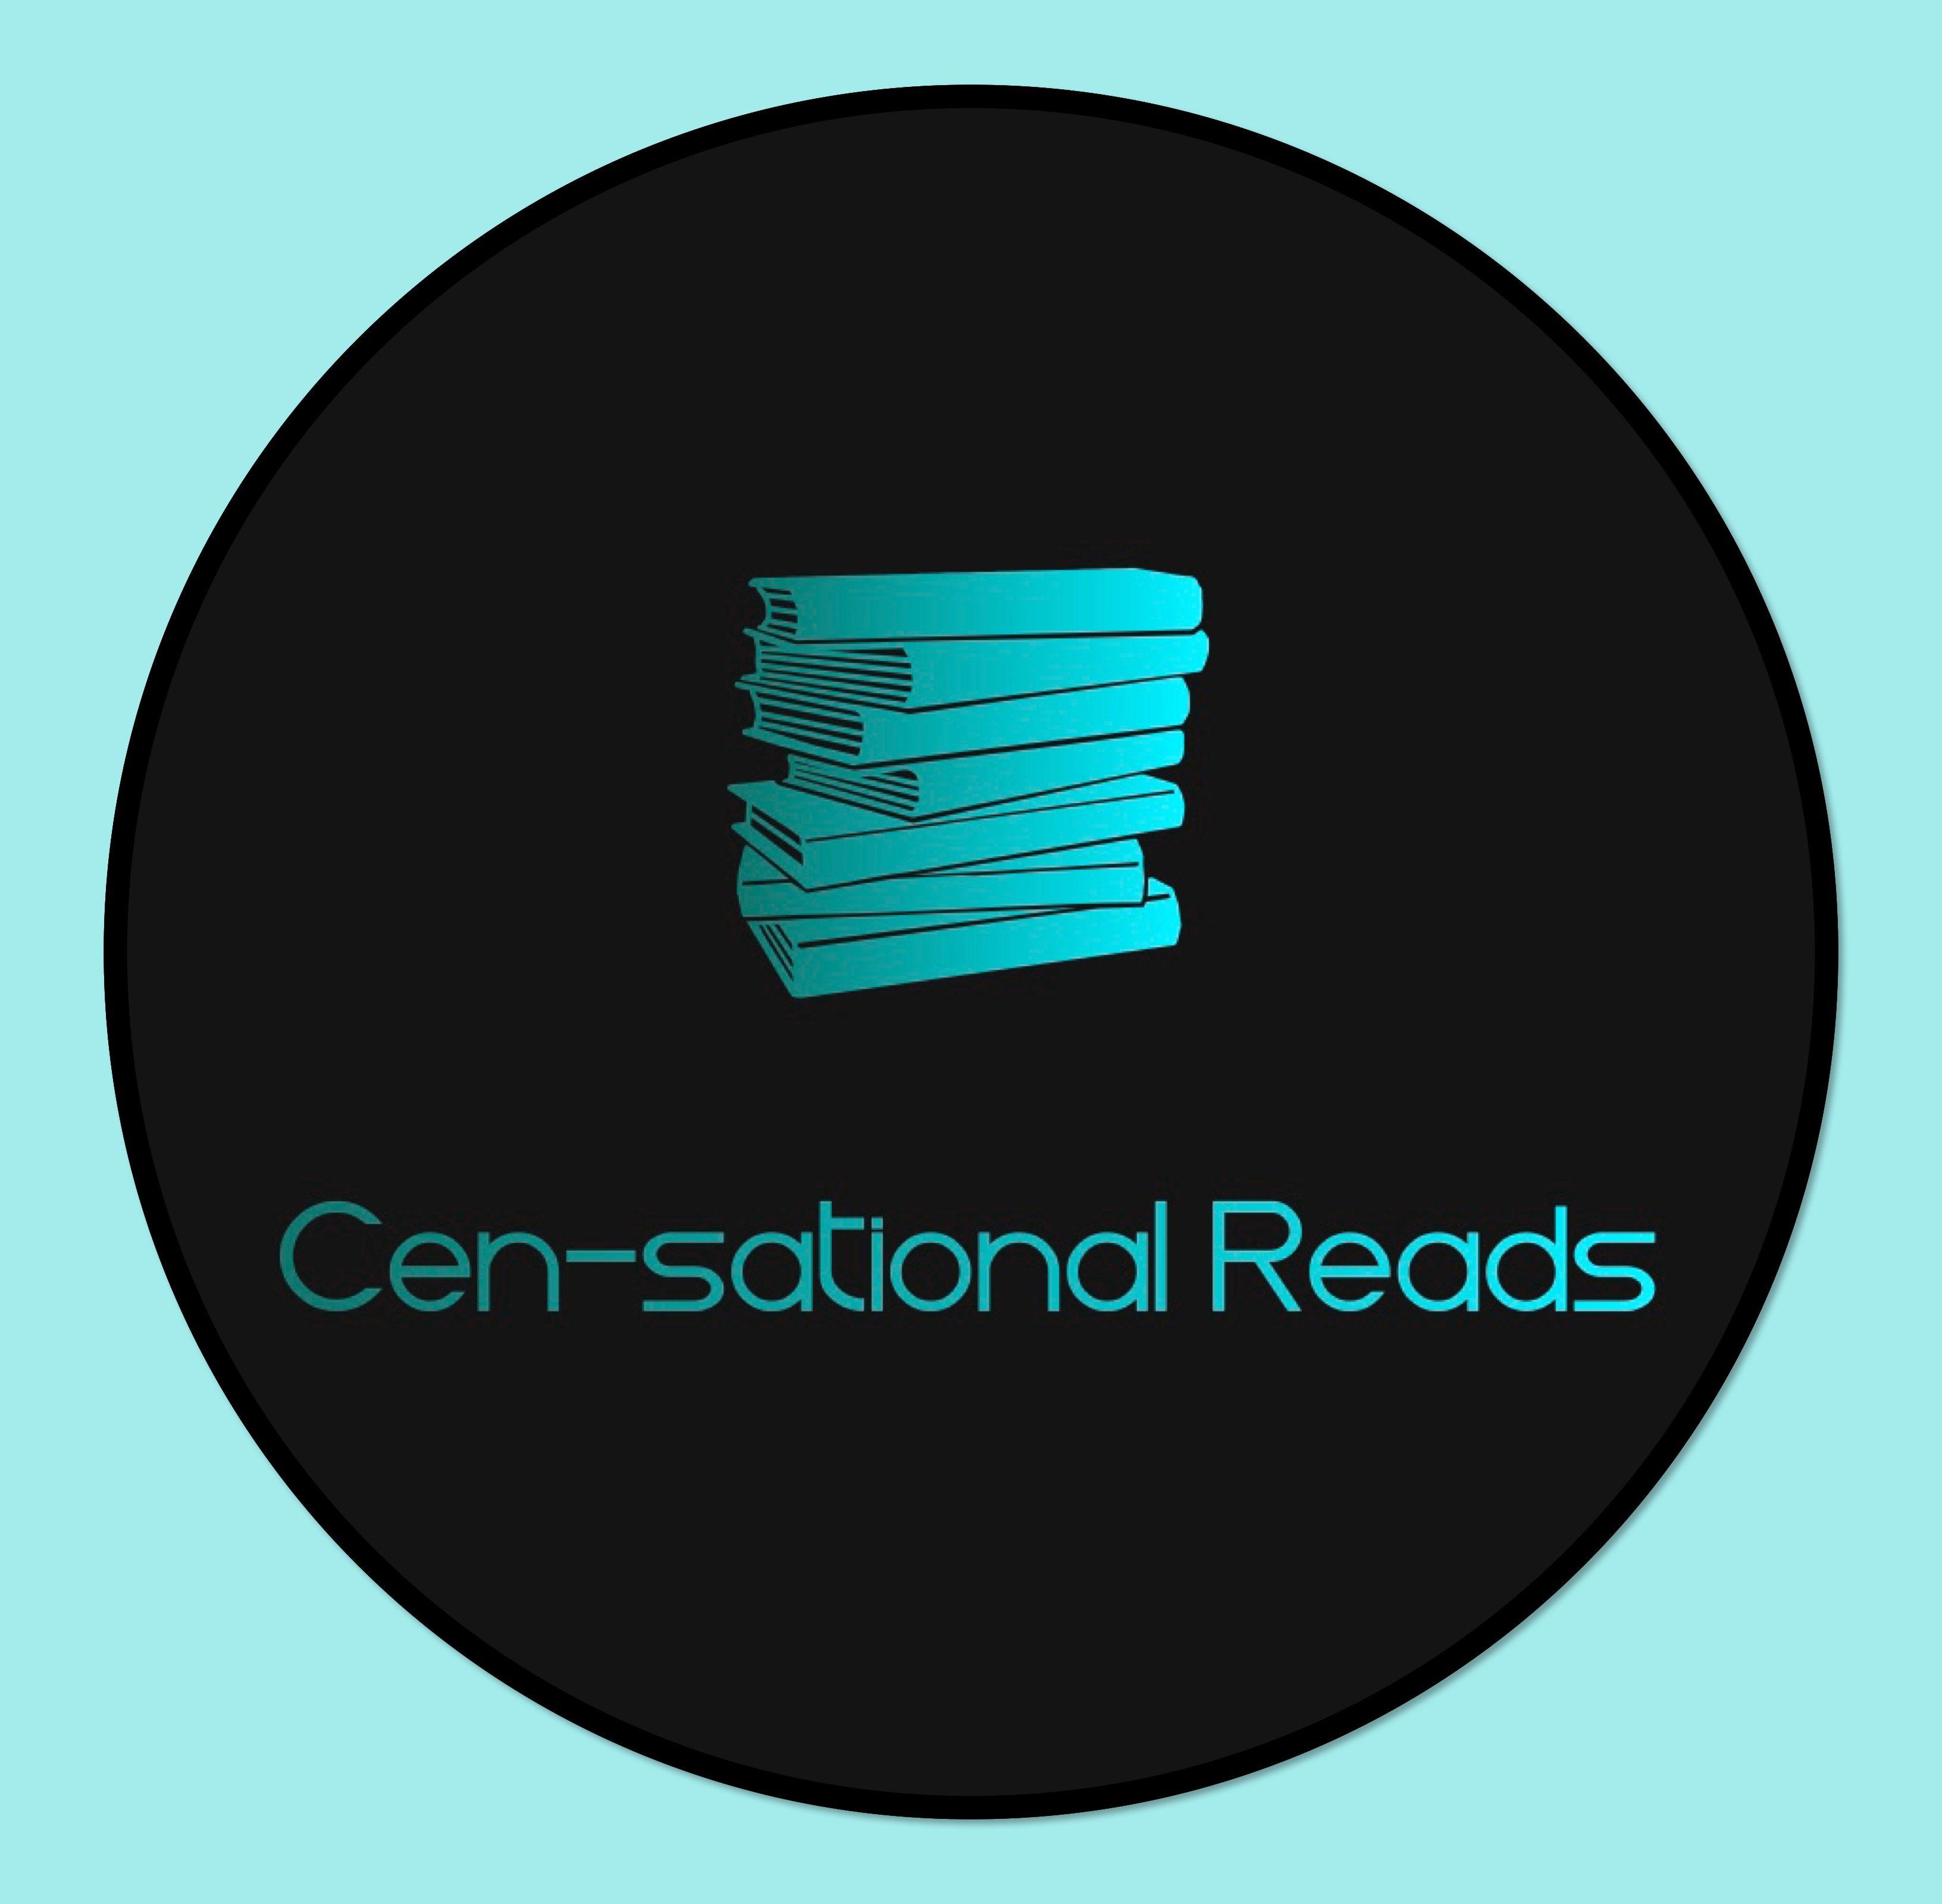 Cen-sational Reads